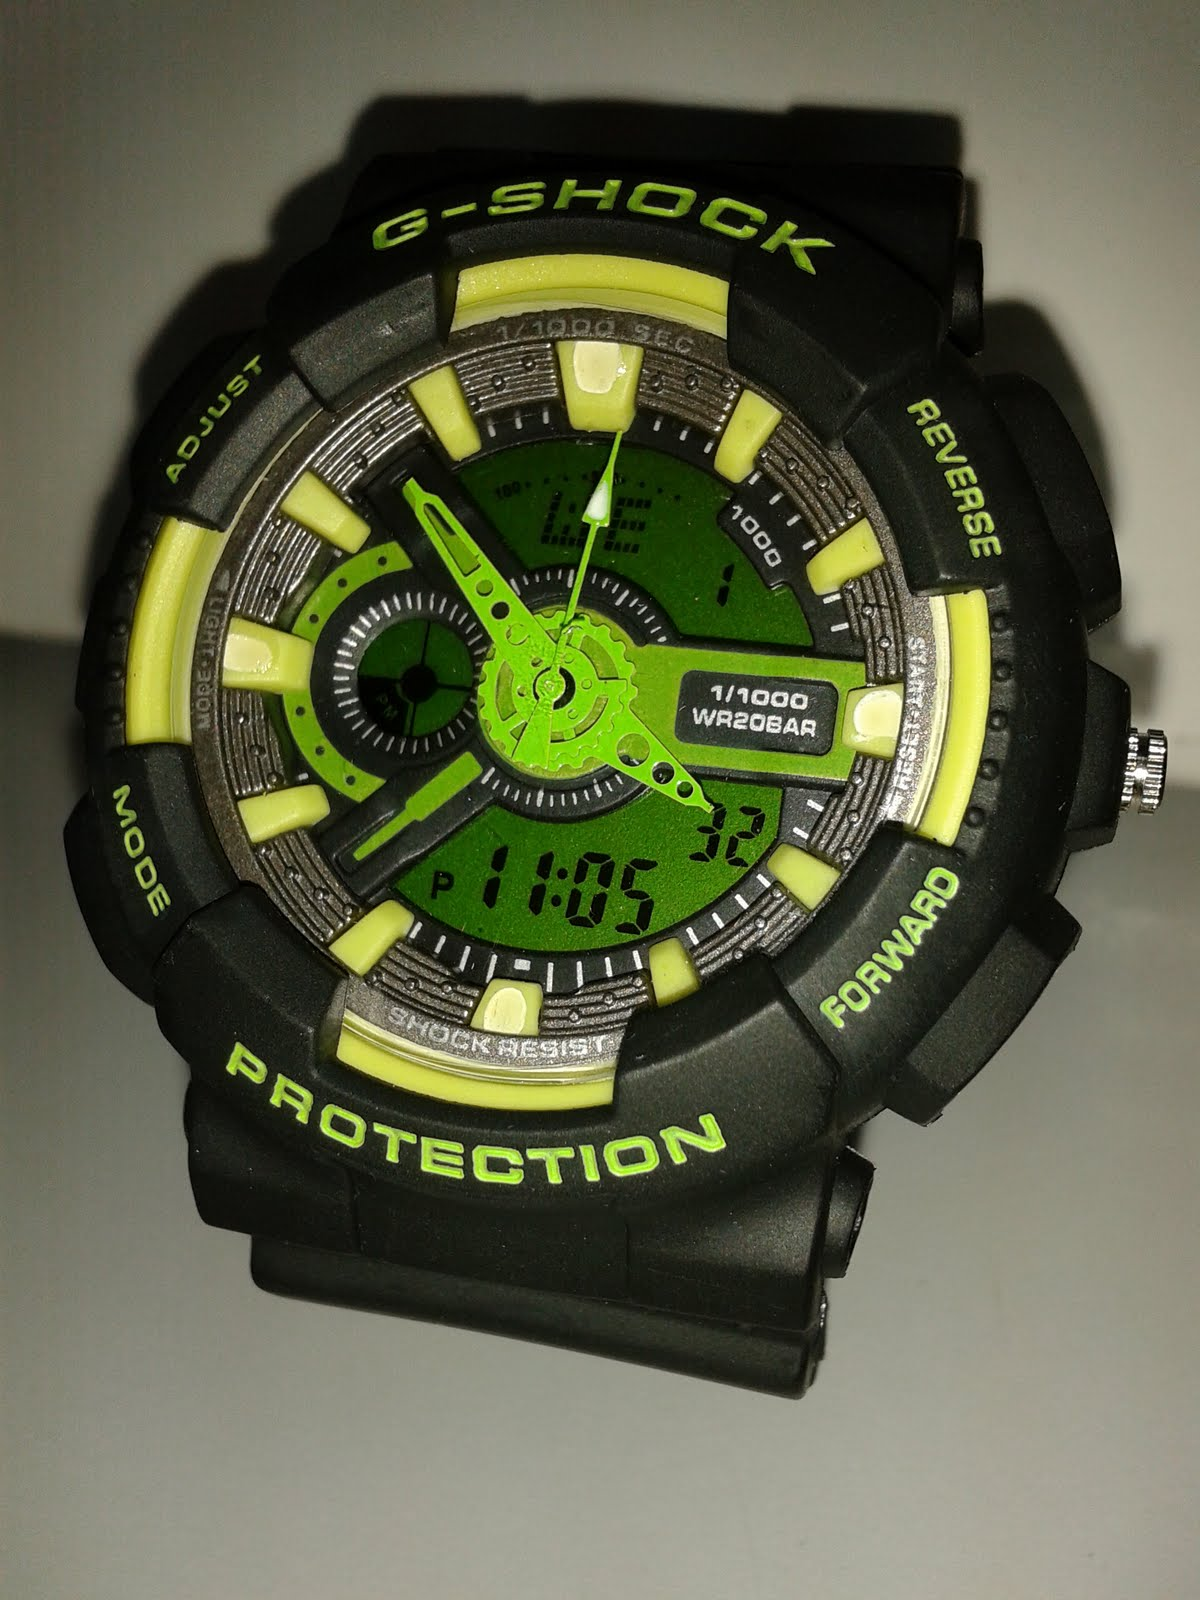 Replica g shock watches - New Stock Replica Casio G Shock Ga110